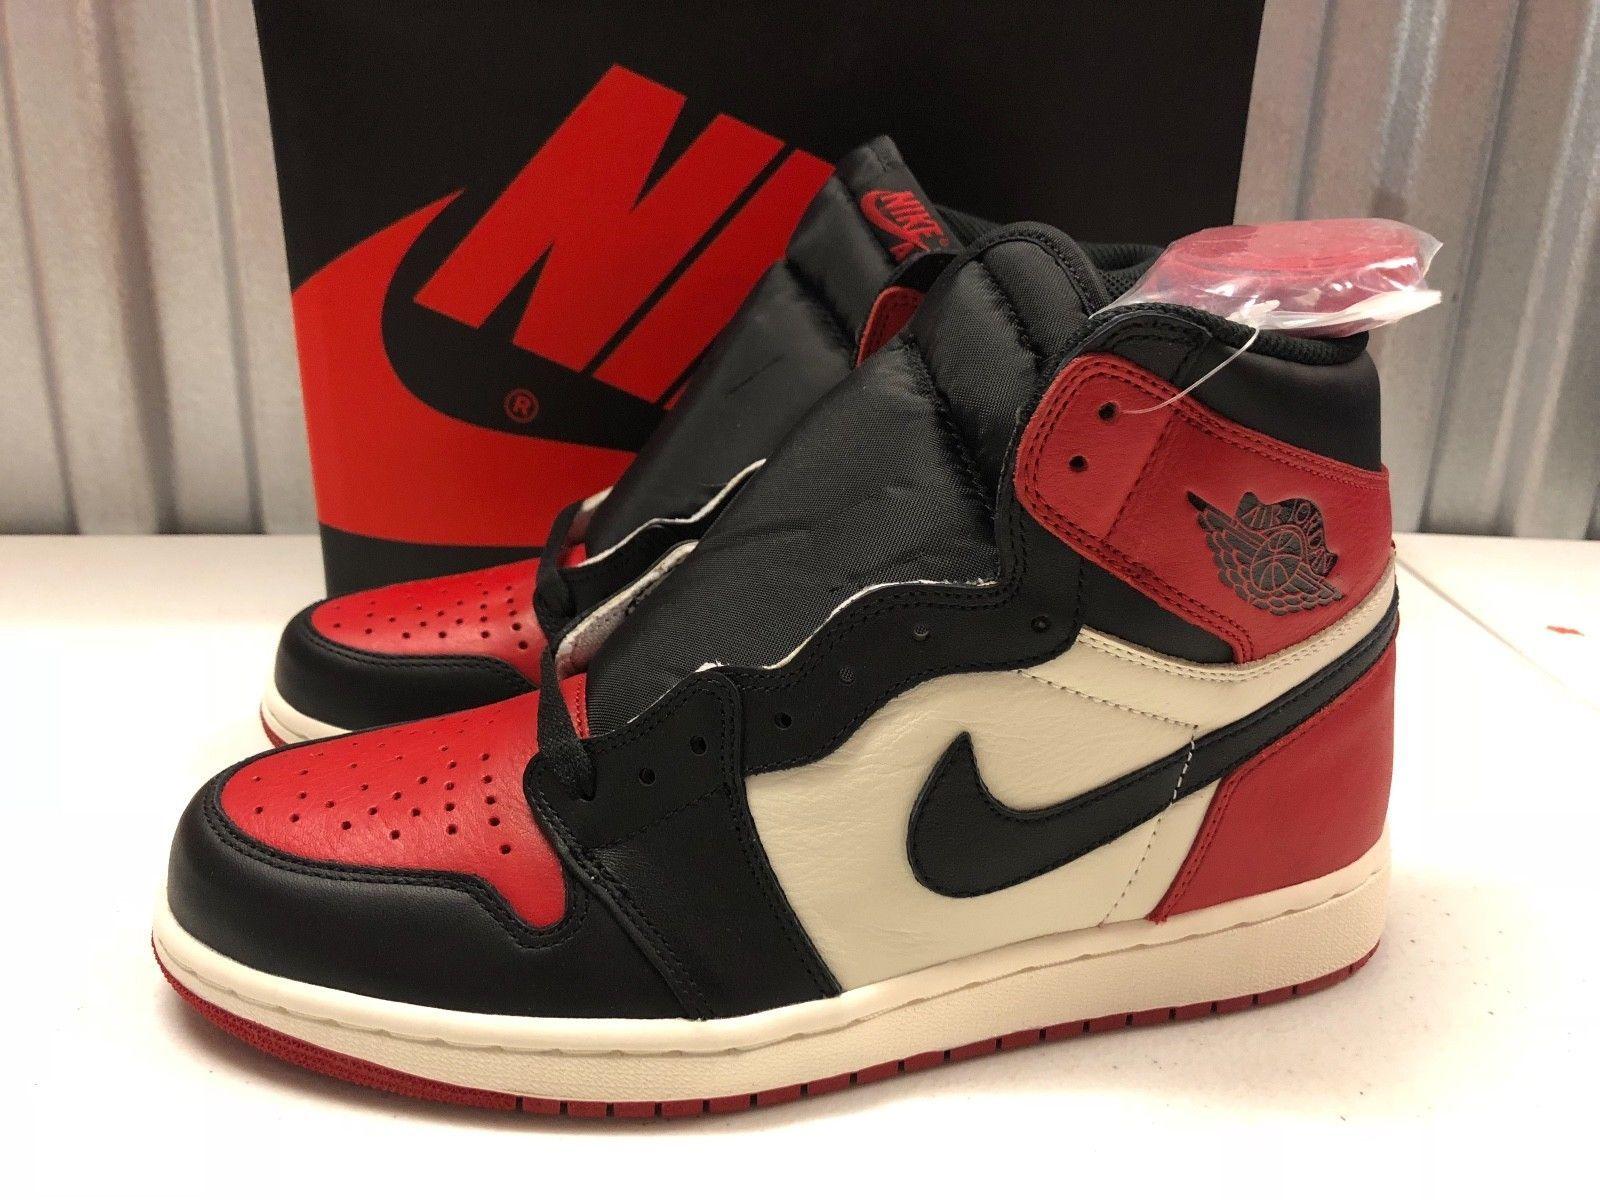 ed523e1767840f Details about 2015 Nike Air Jordan 11 XI Retro 72-10 Size 15. 378037 ...